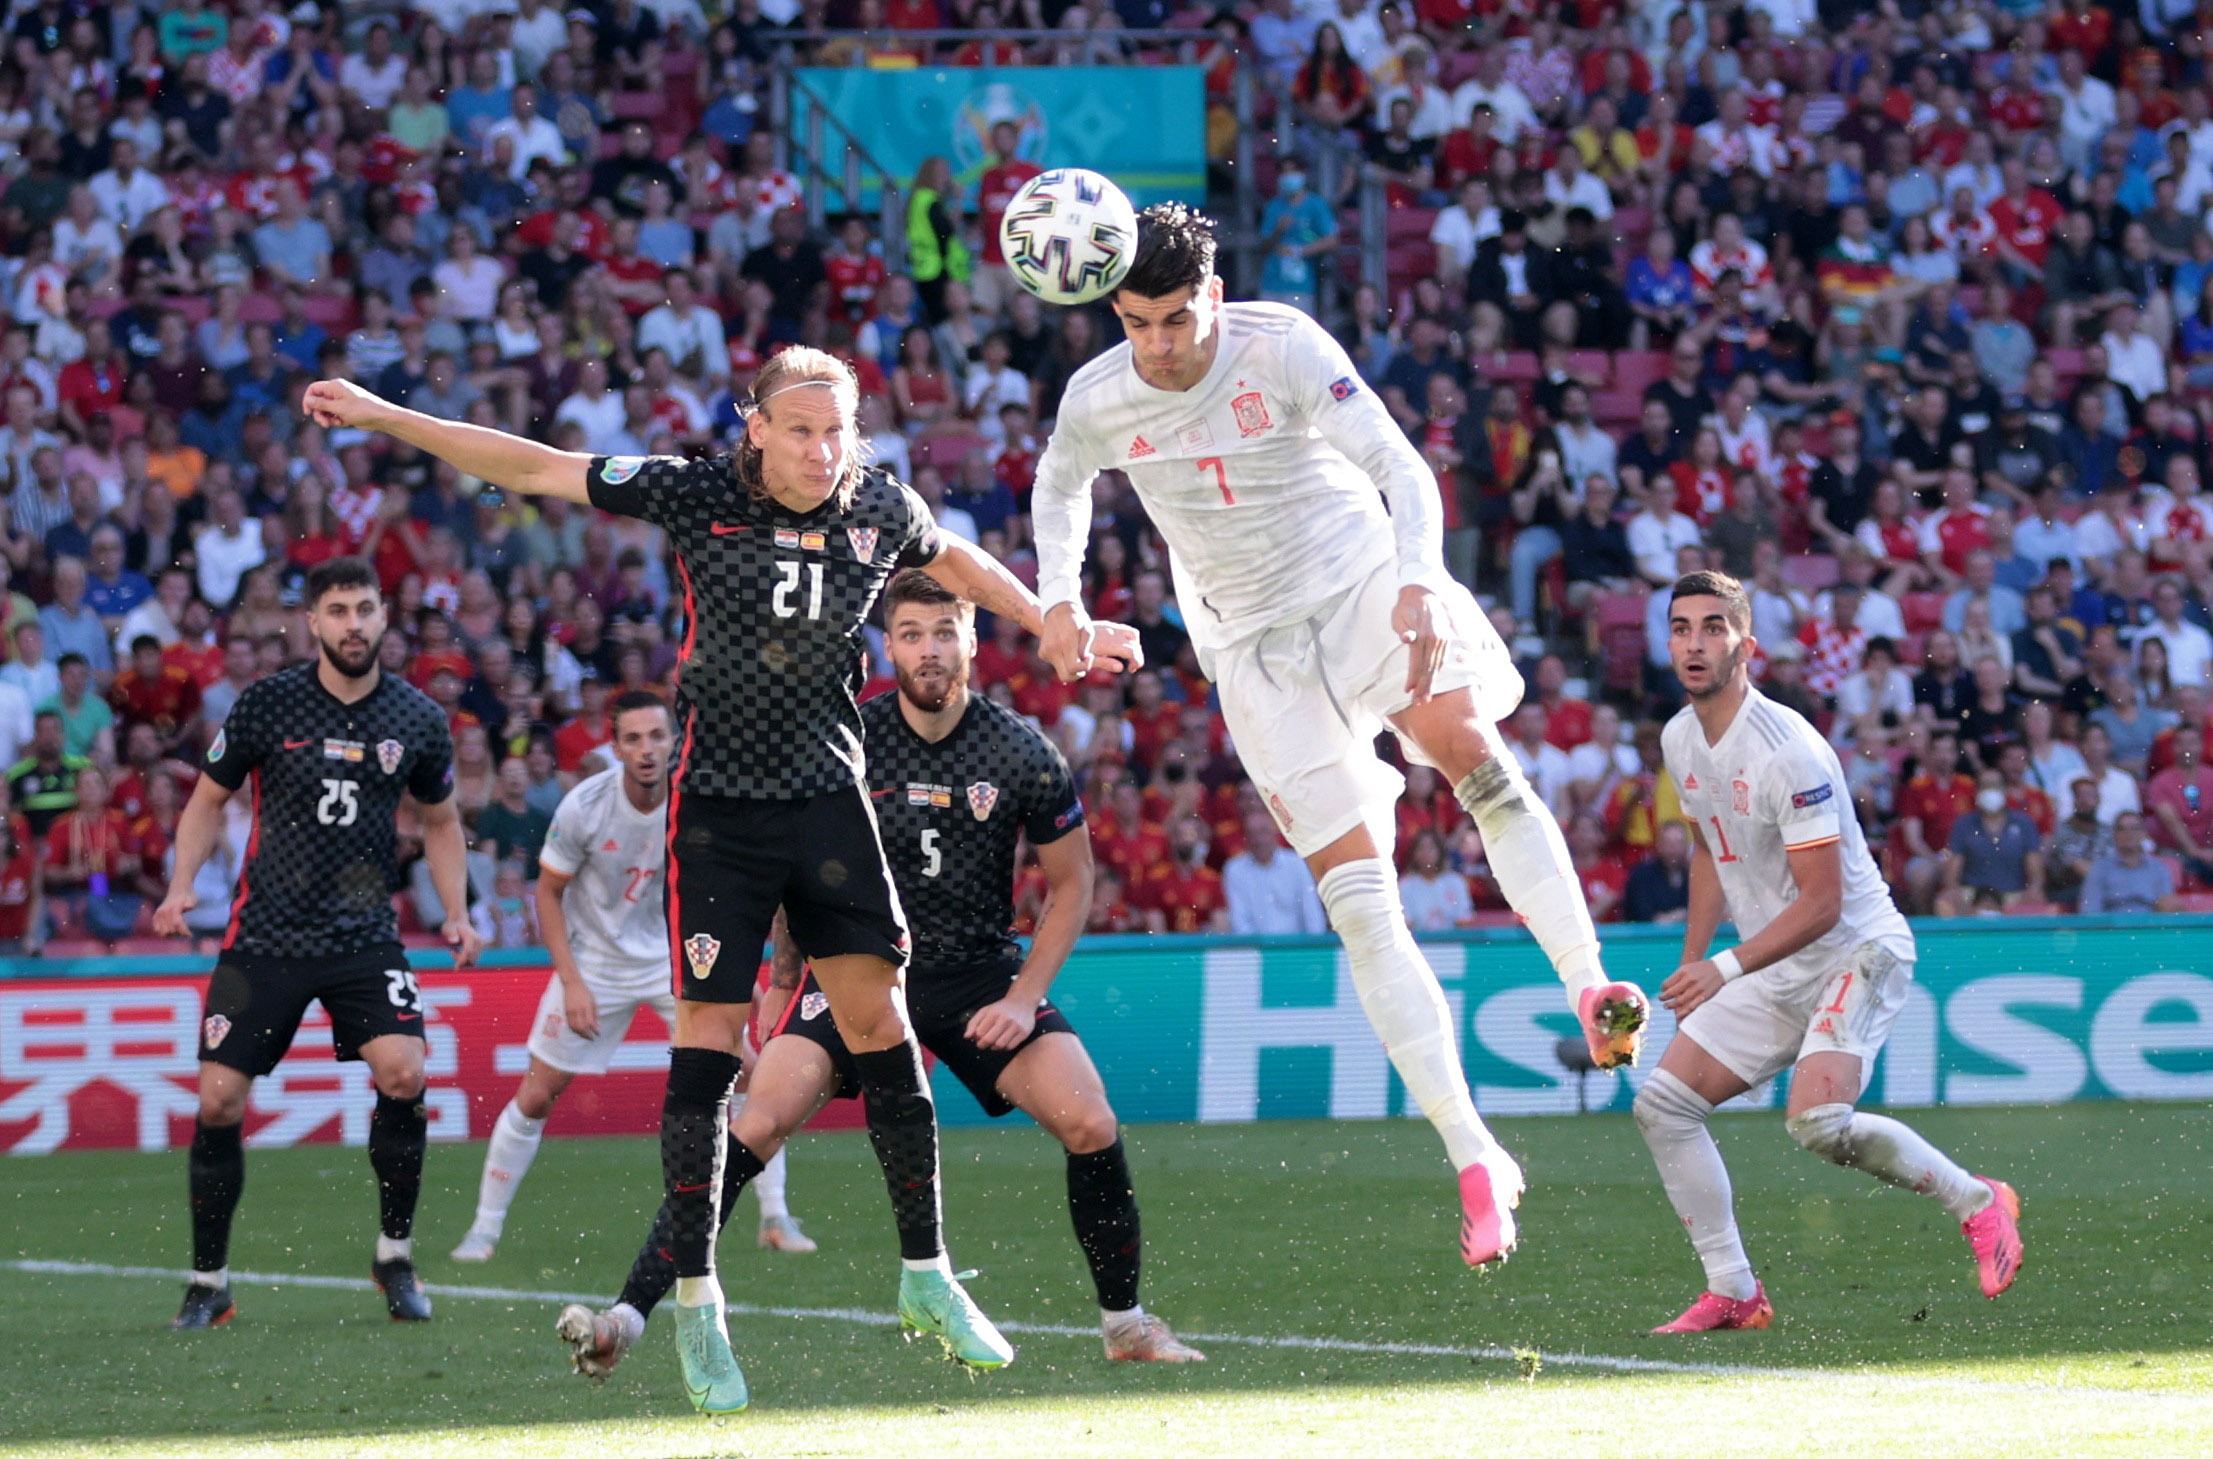 Euro 2020, Κροατία – Ισπανία: Ανατροπή με τρομερή κεφαλιά